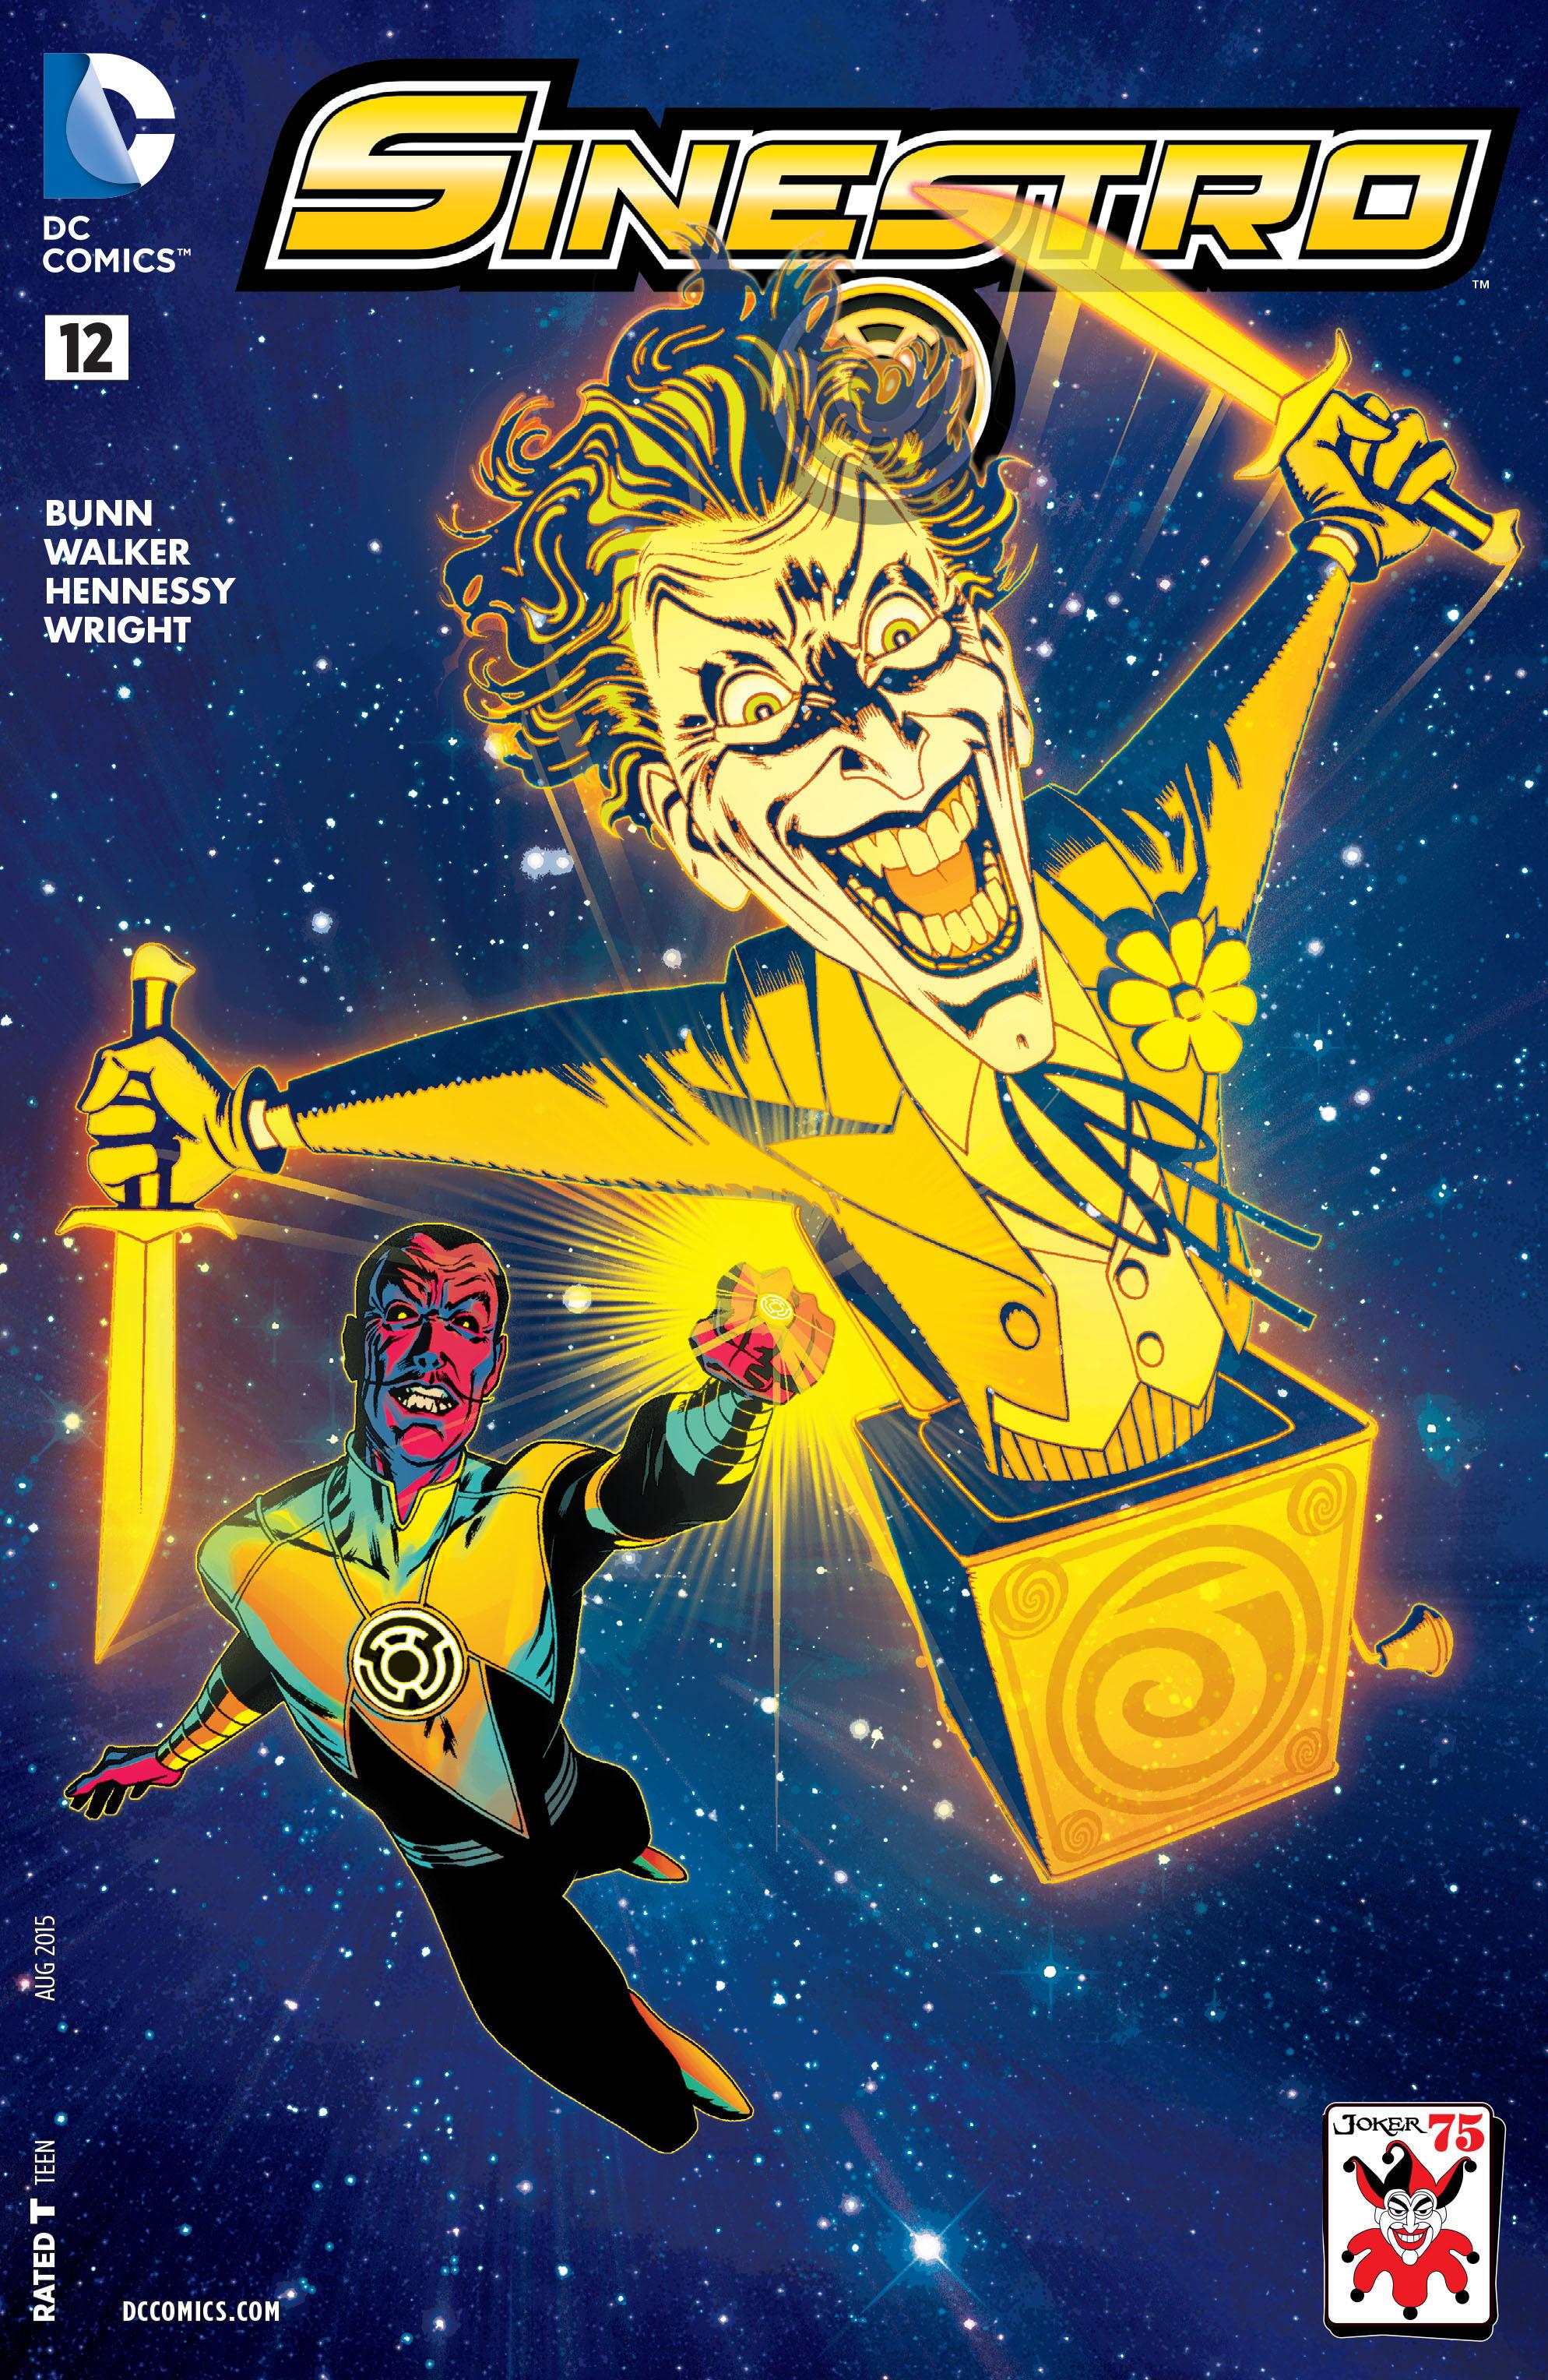 Read online Sinestro comic -  Issue #12 - 3